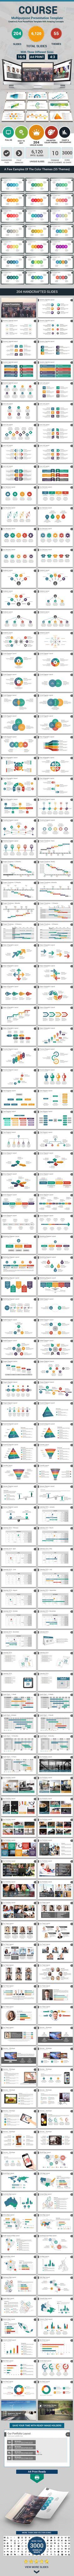 Course Multipurpose PowerPoint Presentation Template (PowerPoint Templates)